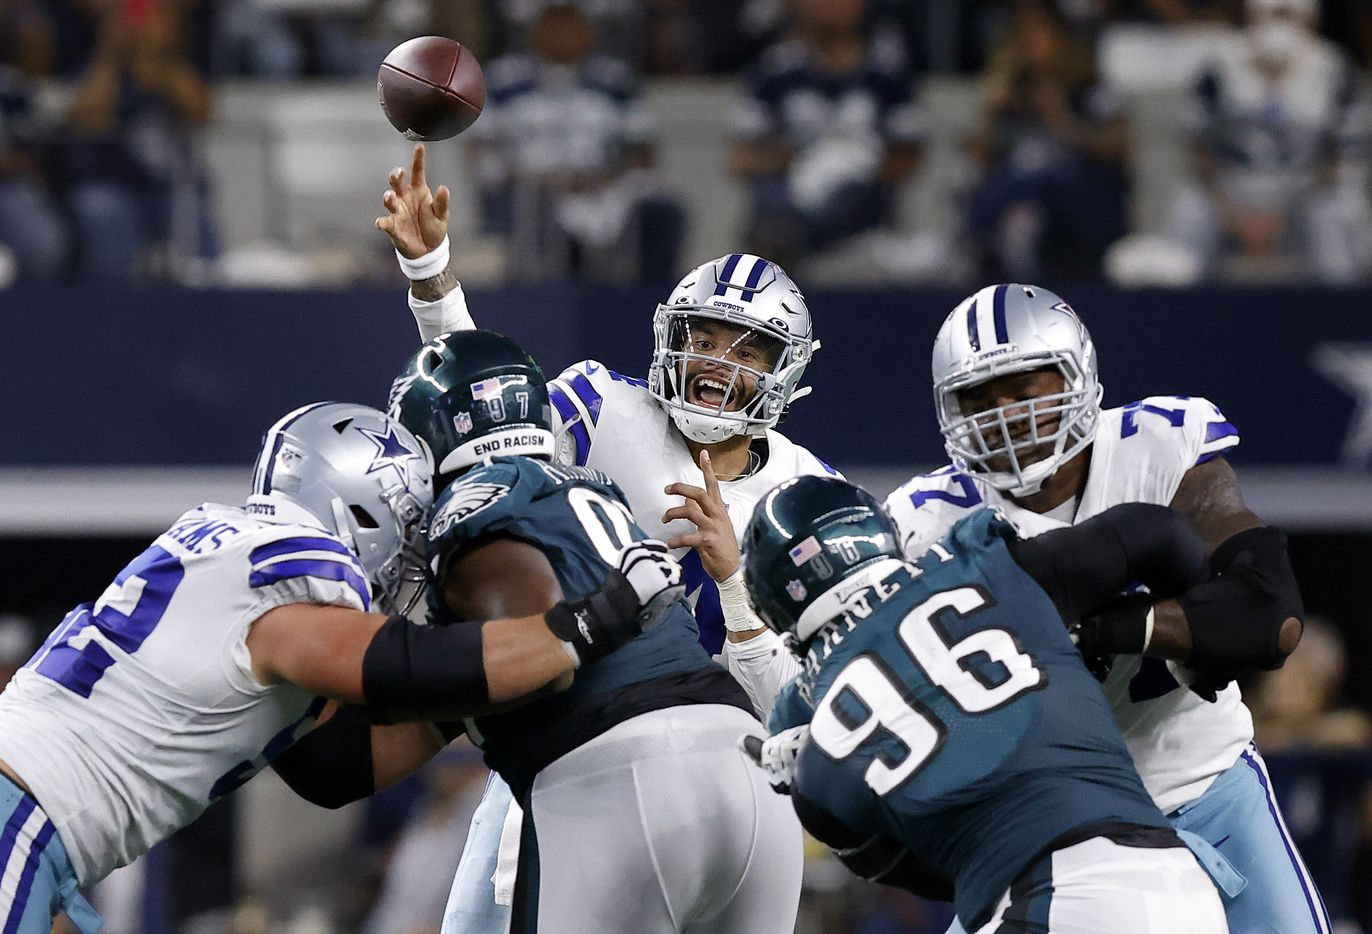 Dallas Cowboys quarterback Dak Prescott (4) releases a pass over the Philadelphia Eagles defensive line during the second quarter at AT&T Stadium in Arlington, Monday, September 27, 2021. (Tom Fox/The Dallas Morning News)